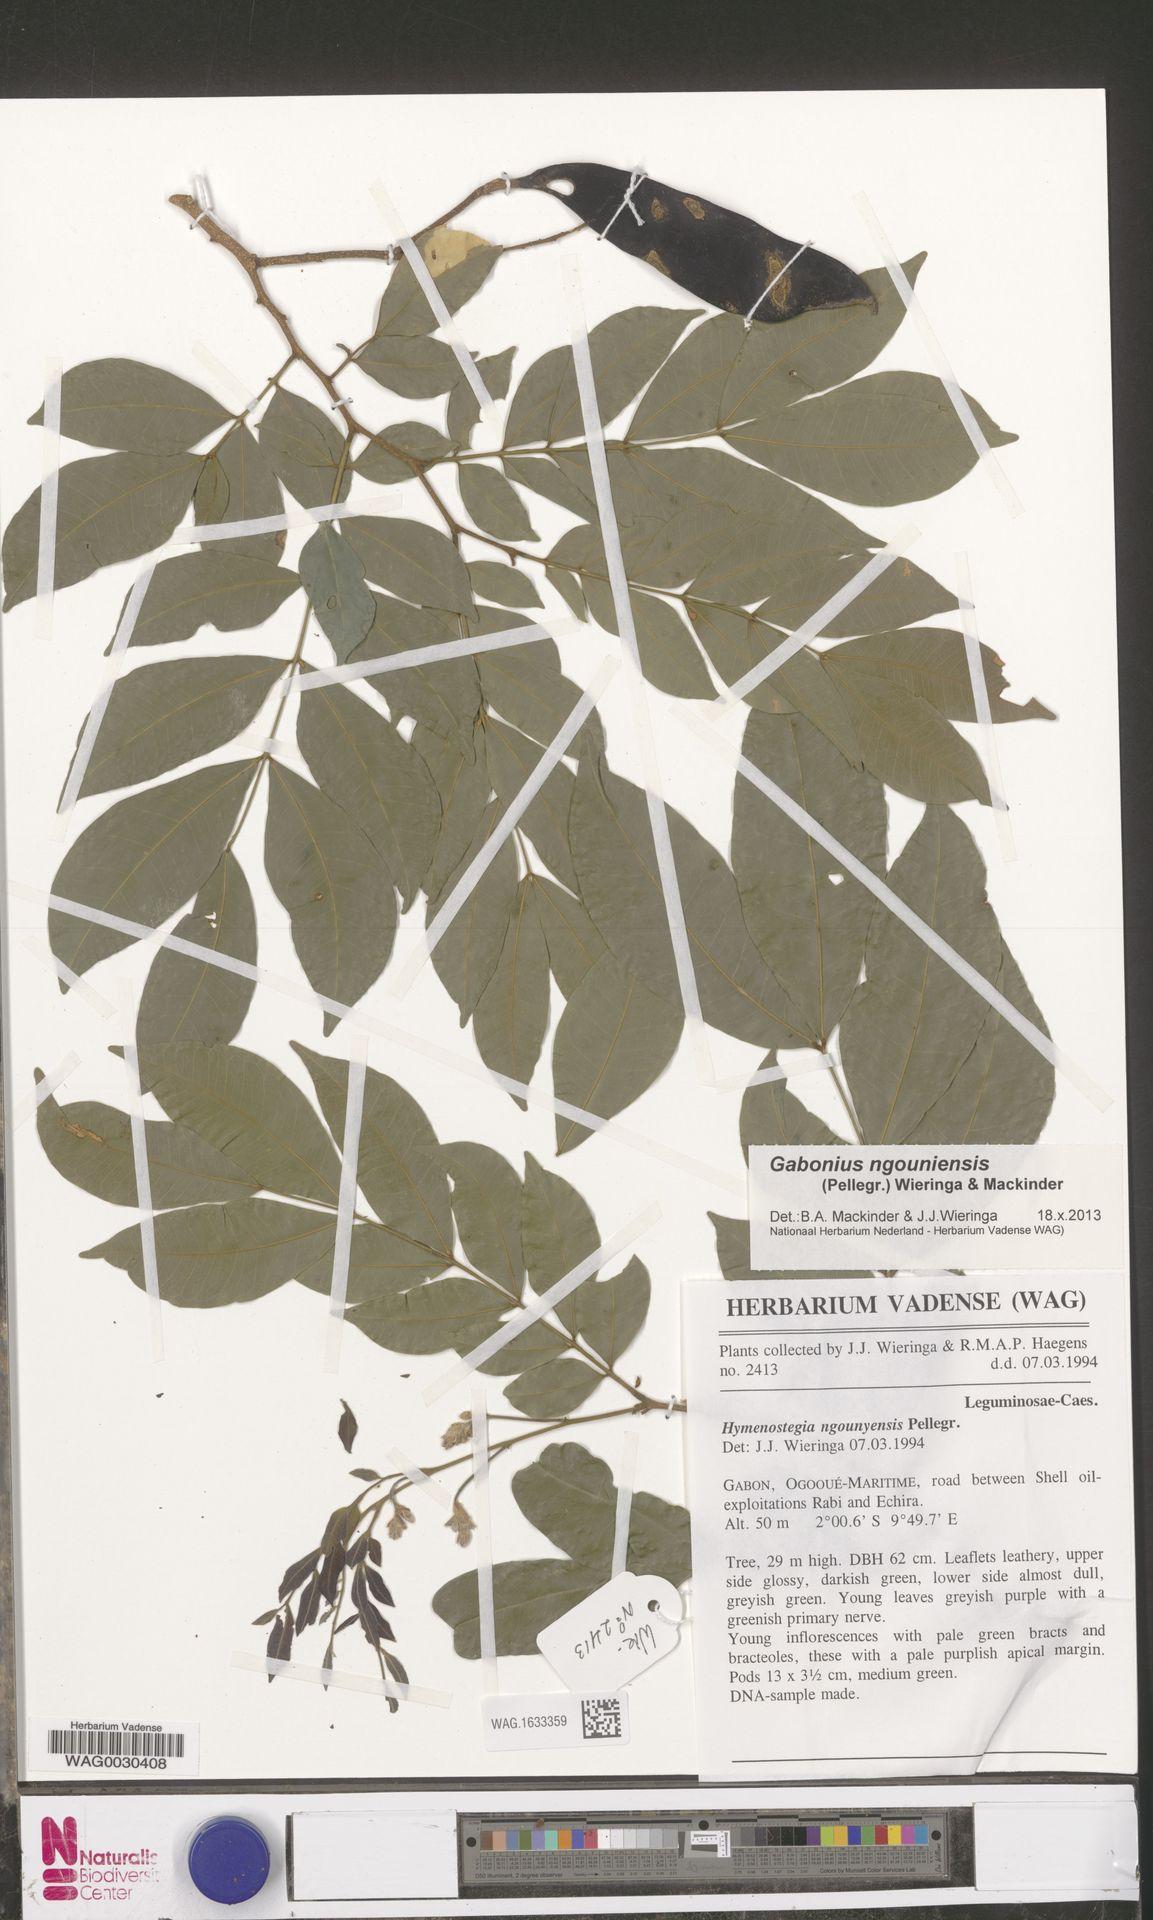 WAG.1633359 | Gabonius ngouniensis (Pellegr.) Wieringa & Mackinder